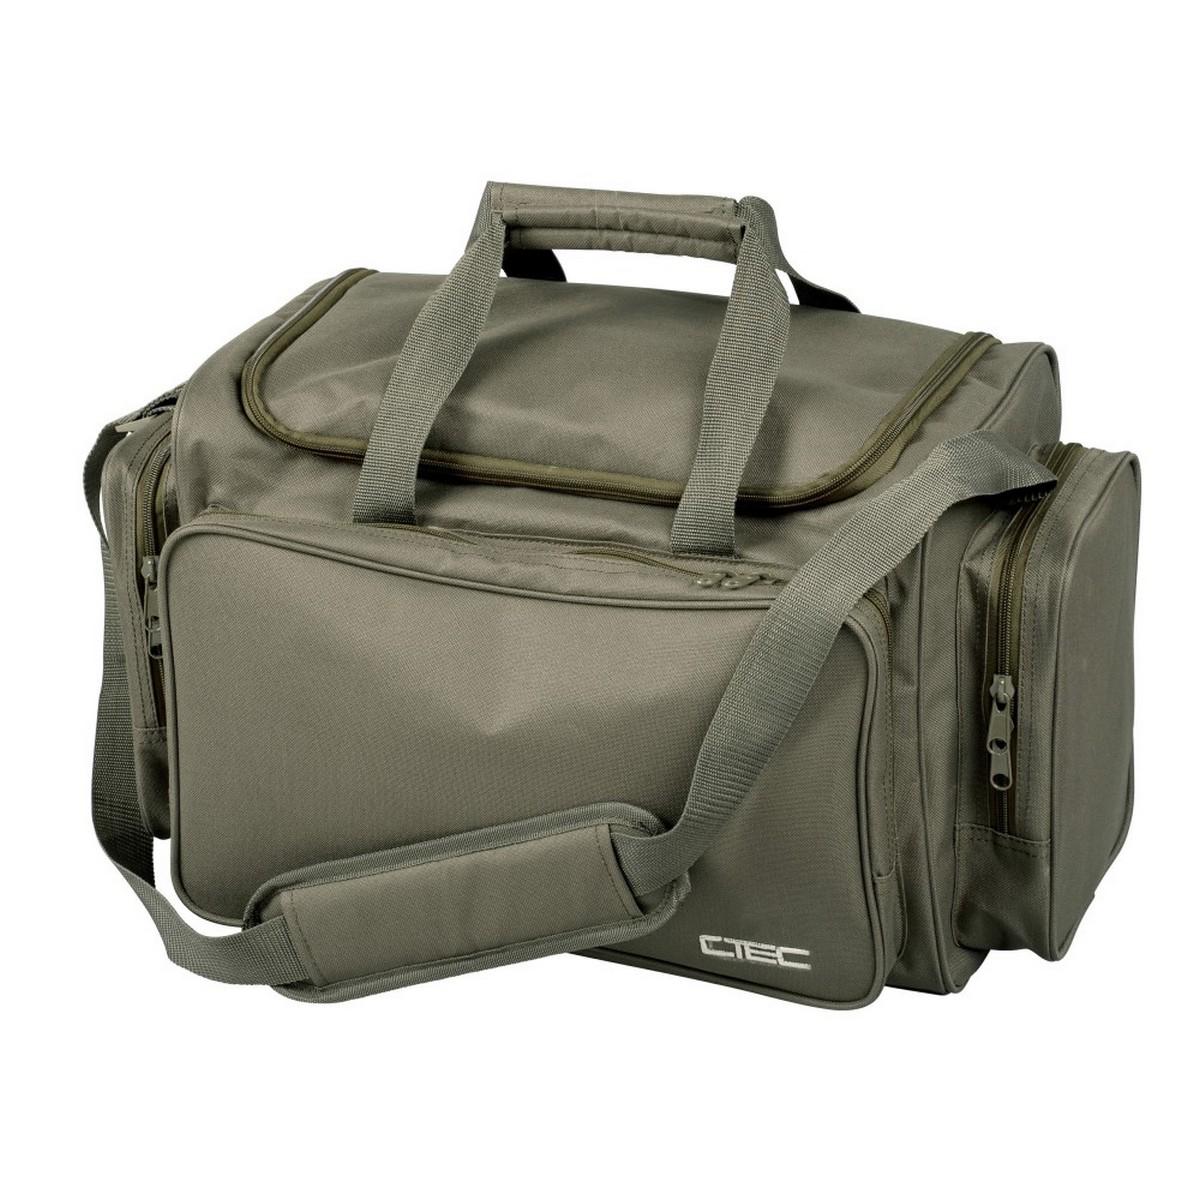 Сак шаранджийски SPRO C-TEC Carry All M